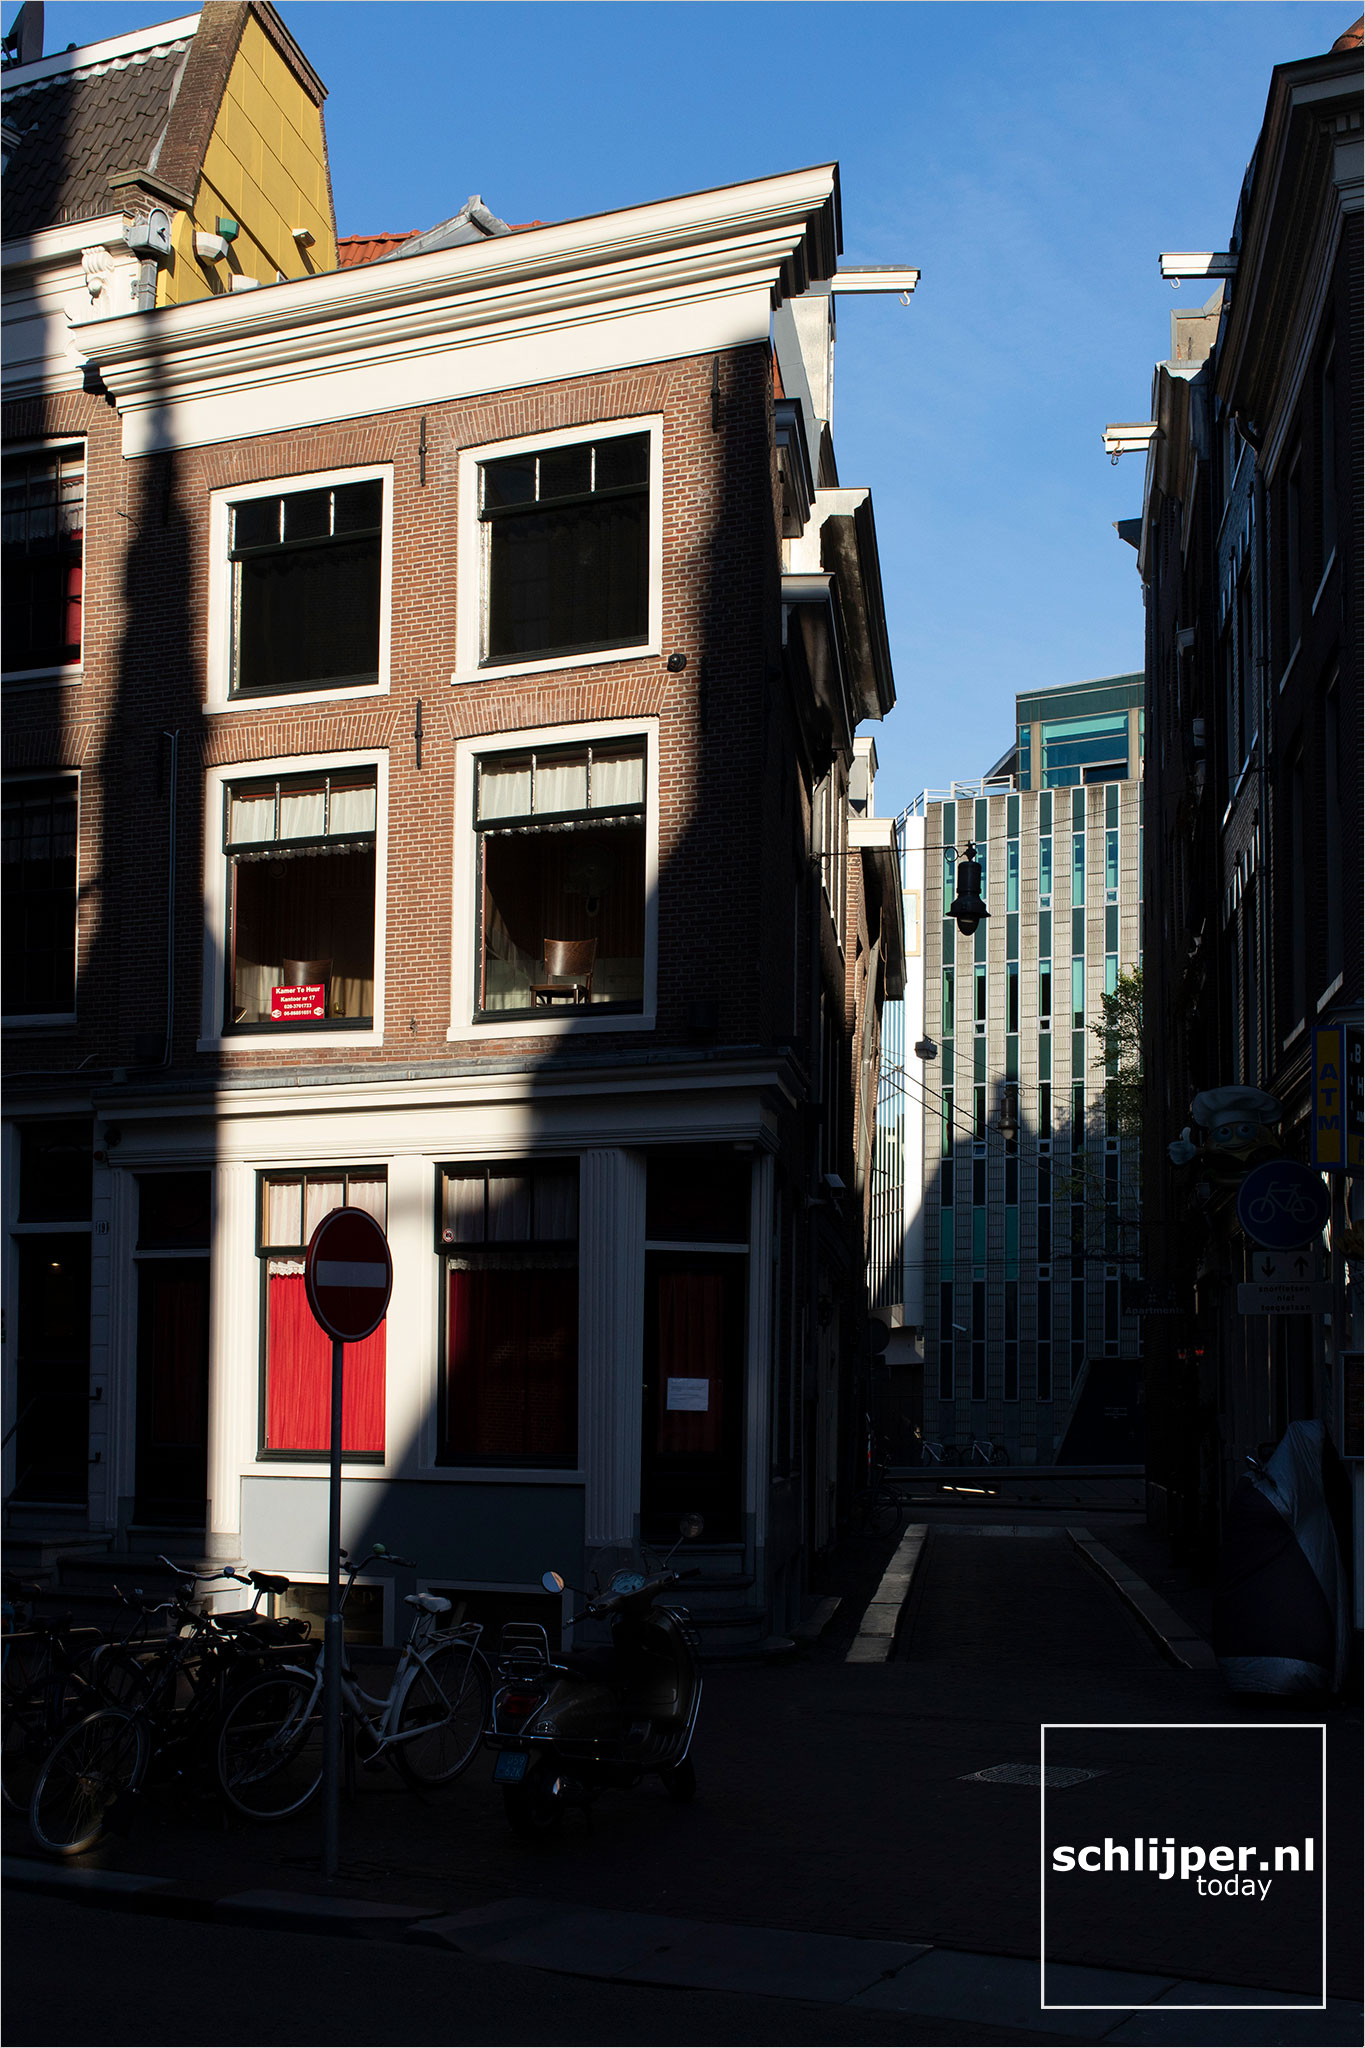 Nederland, Amsterdam, 6 mei 2020